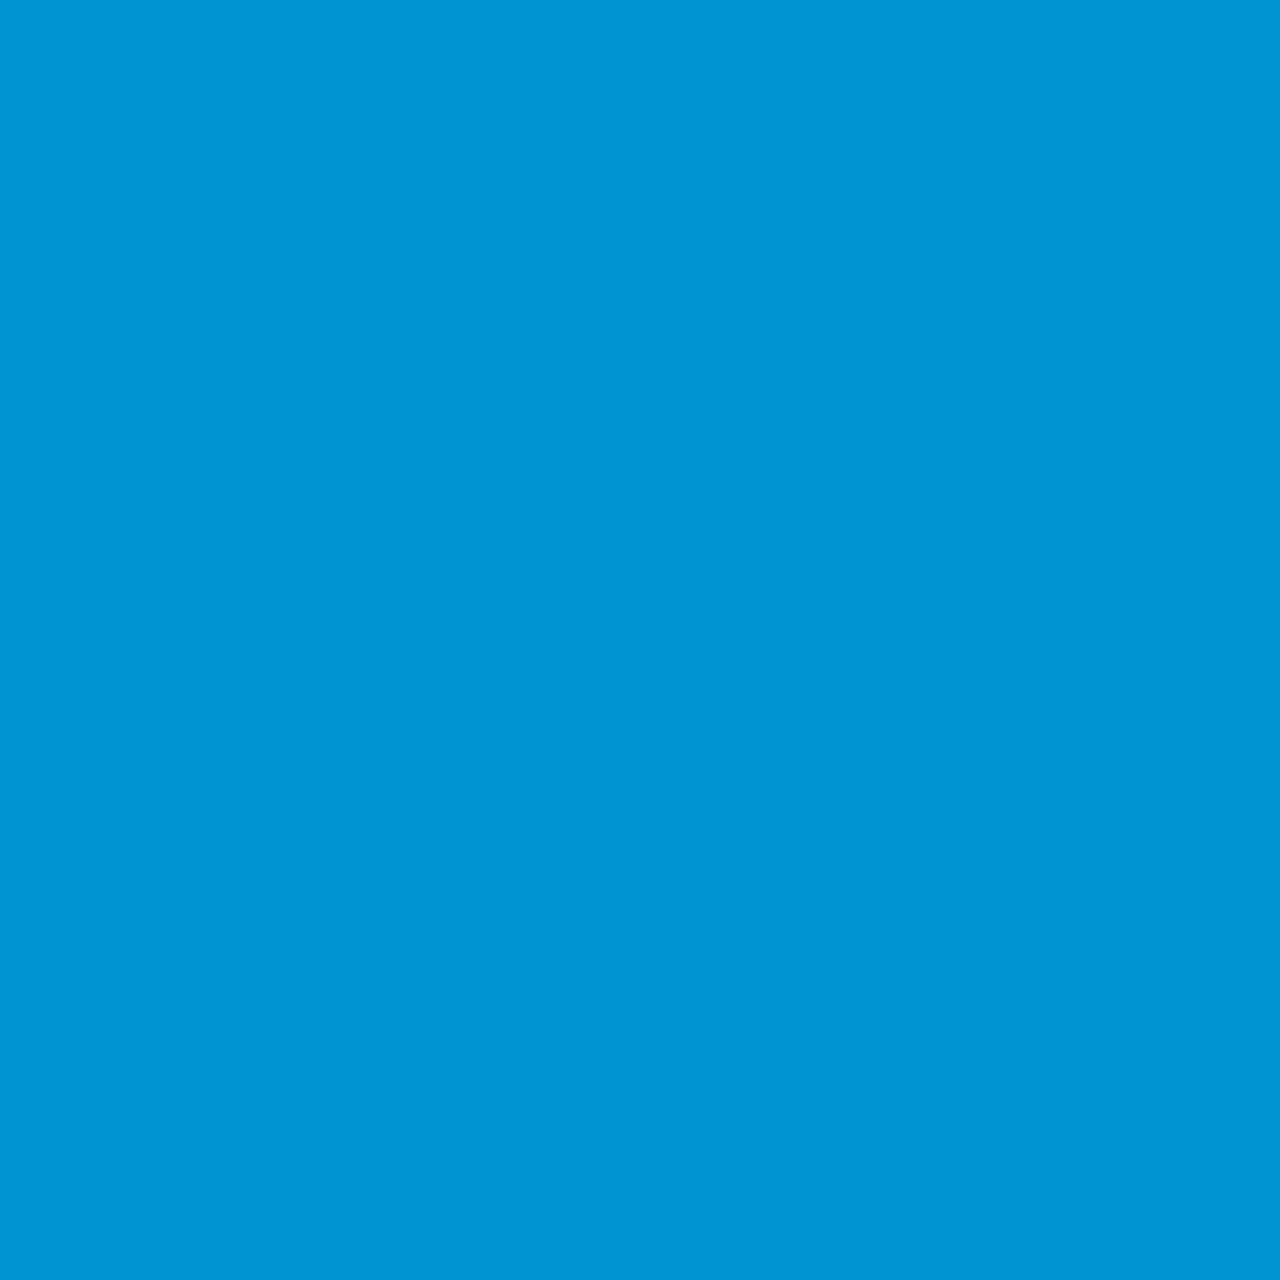 "#0067 Rosco Gels Roscolux Light Sky Blue, 20x24"""